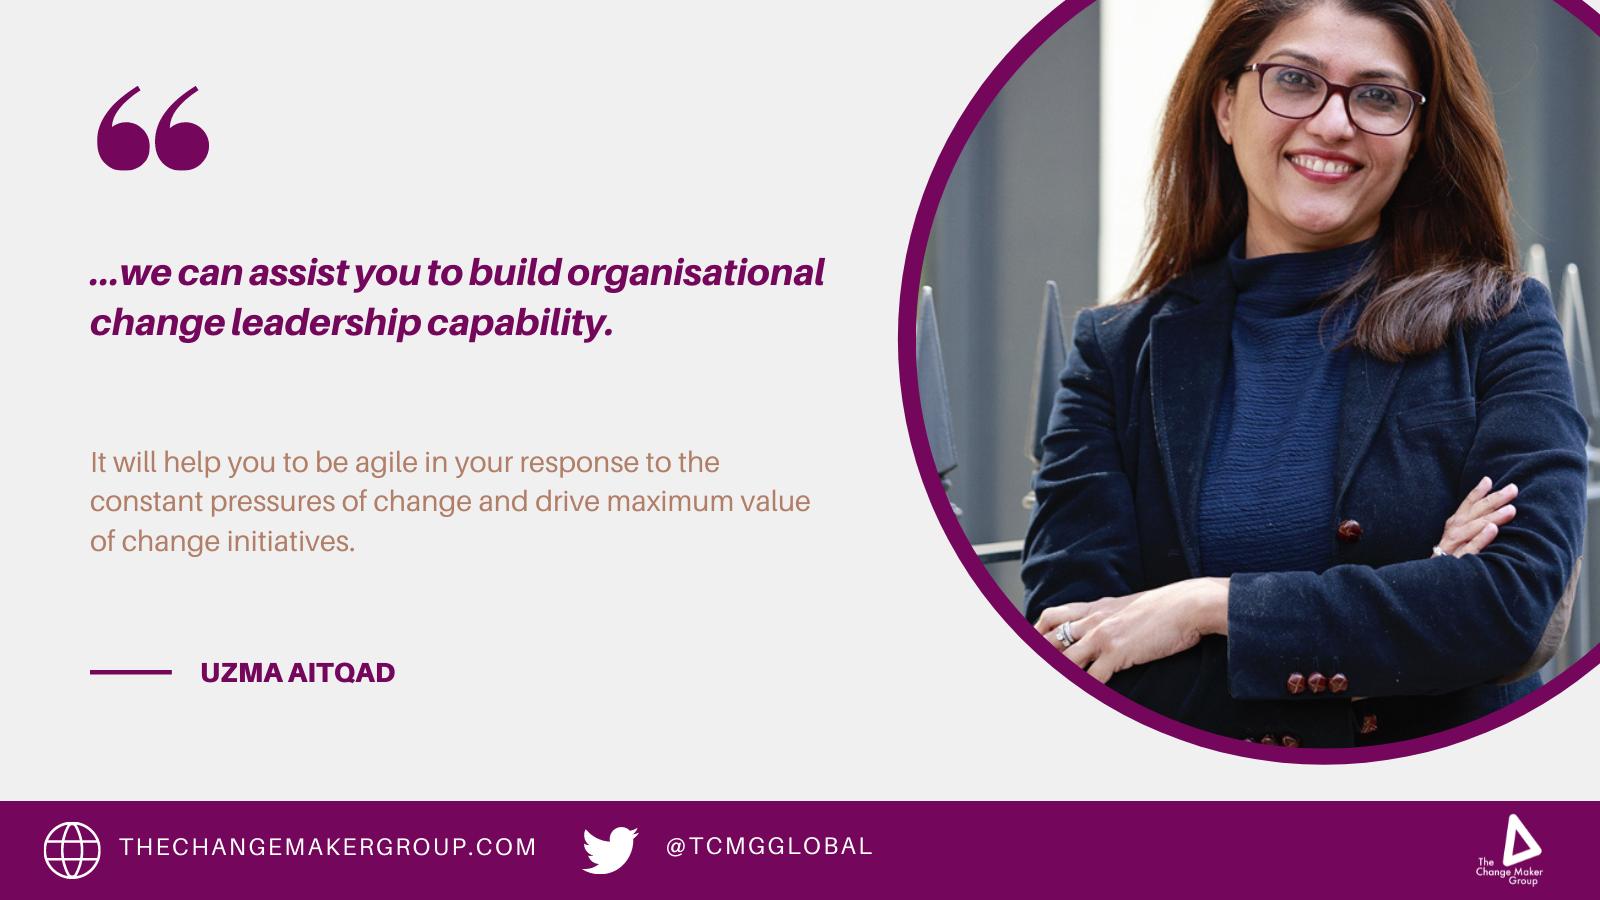 Building organisational change capability